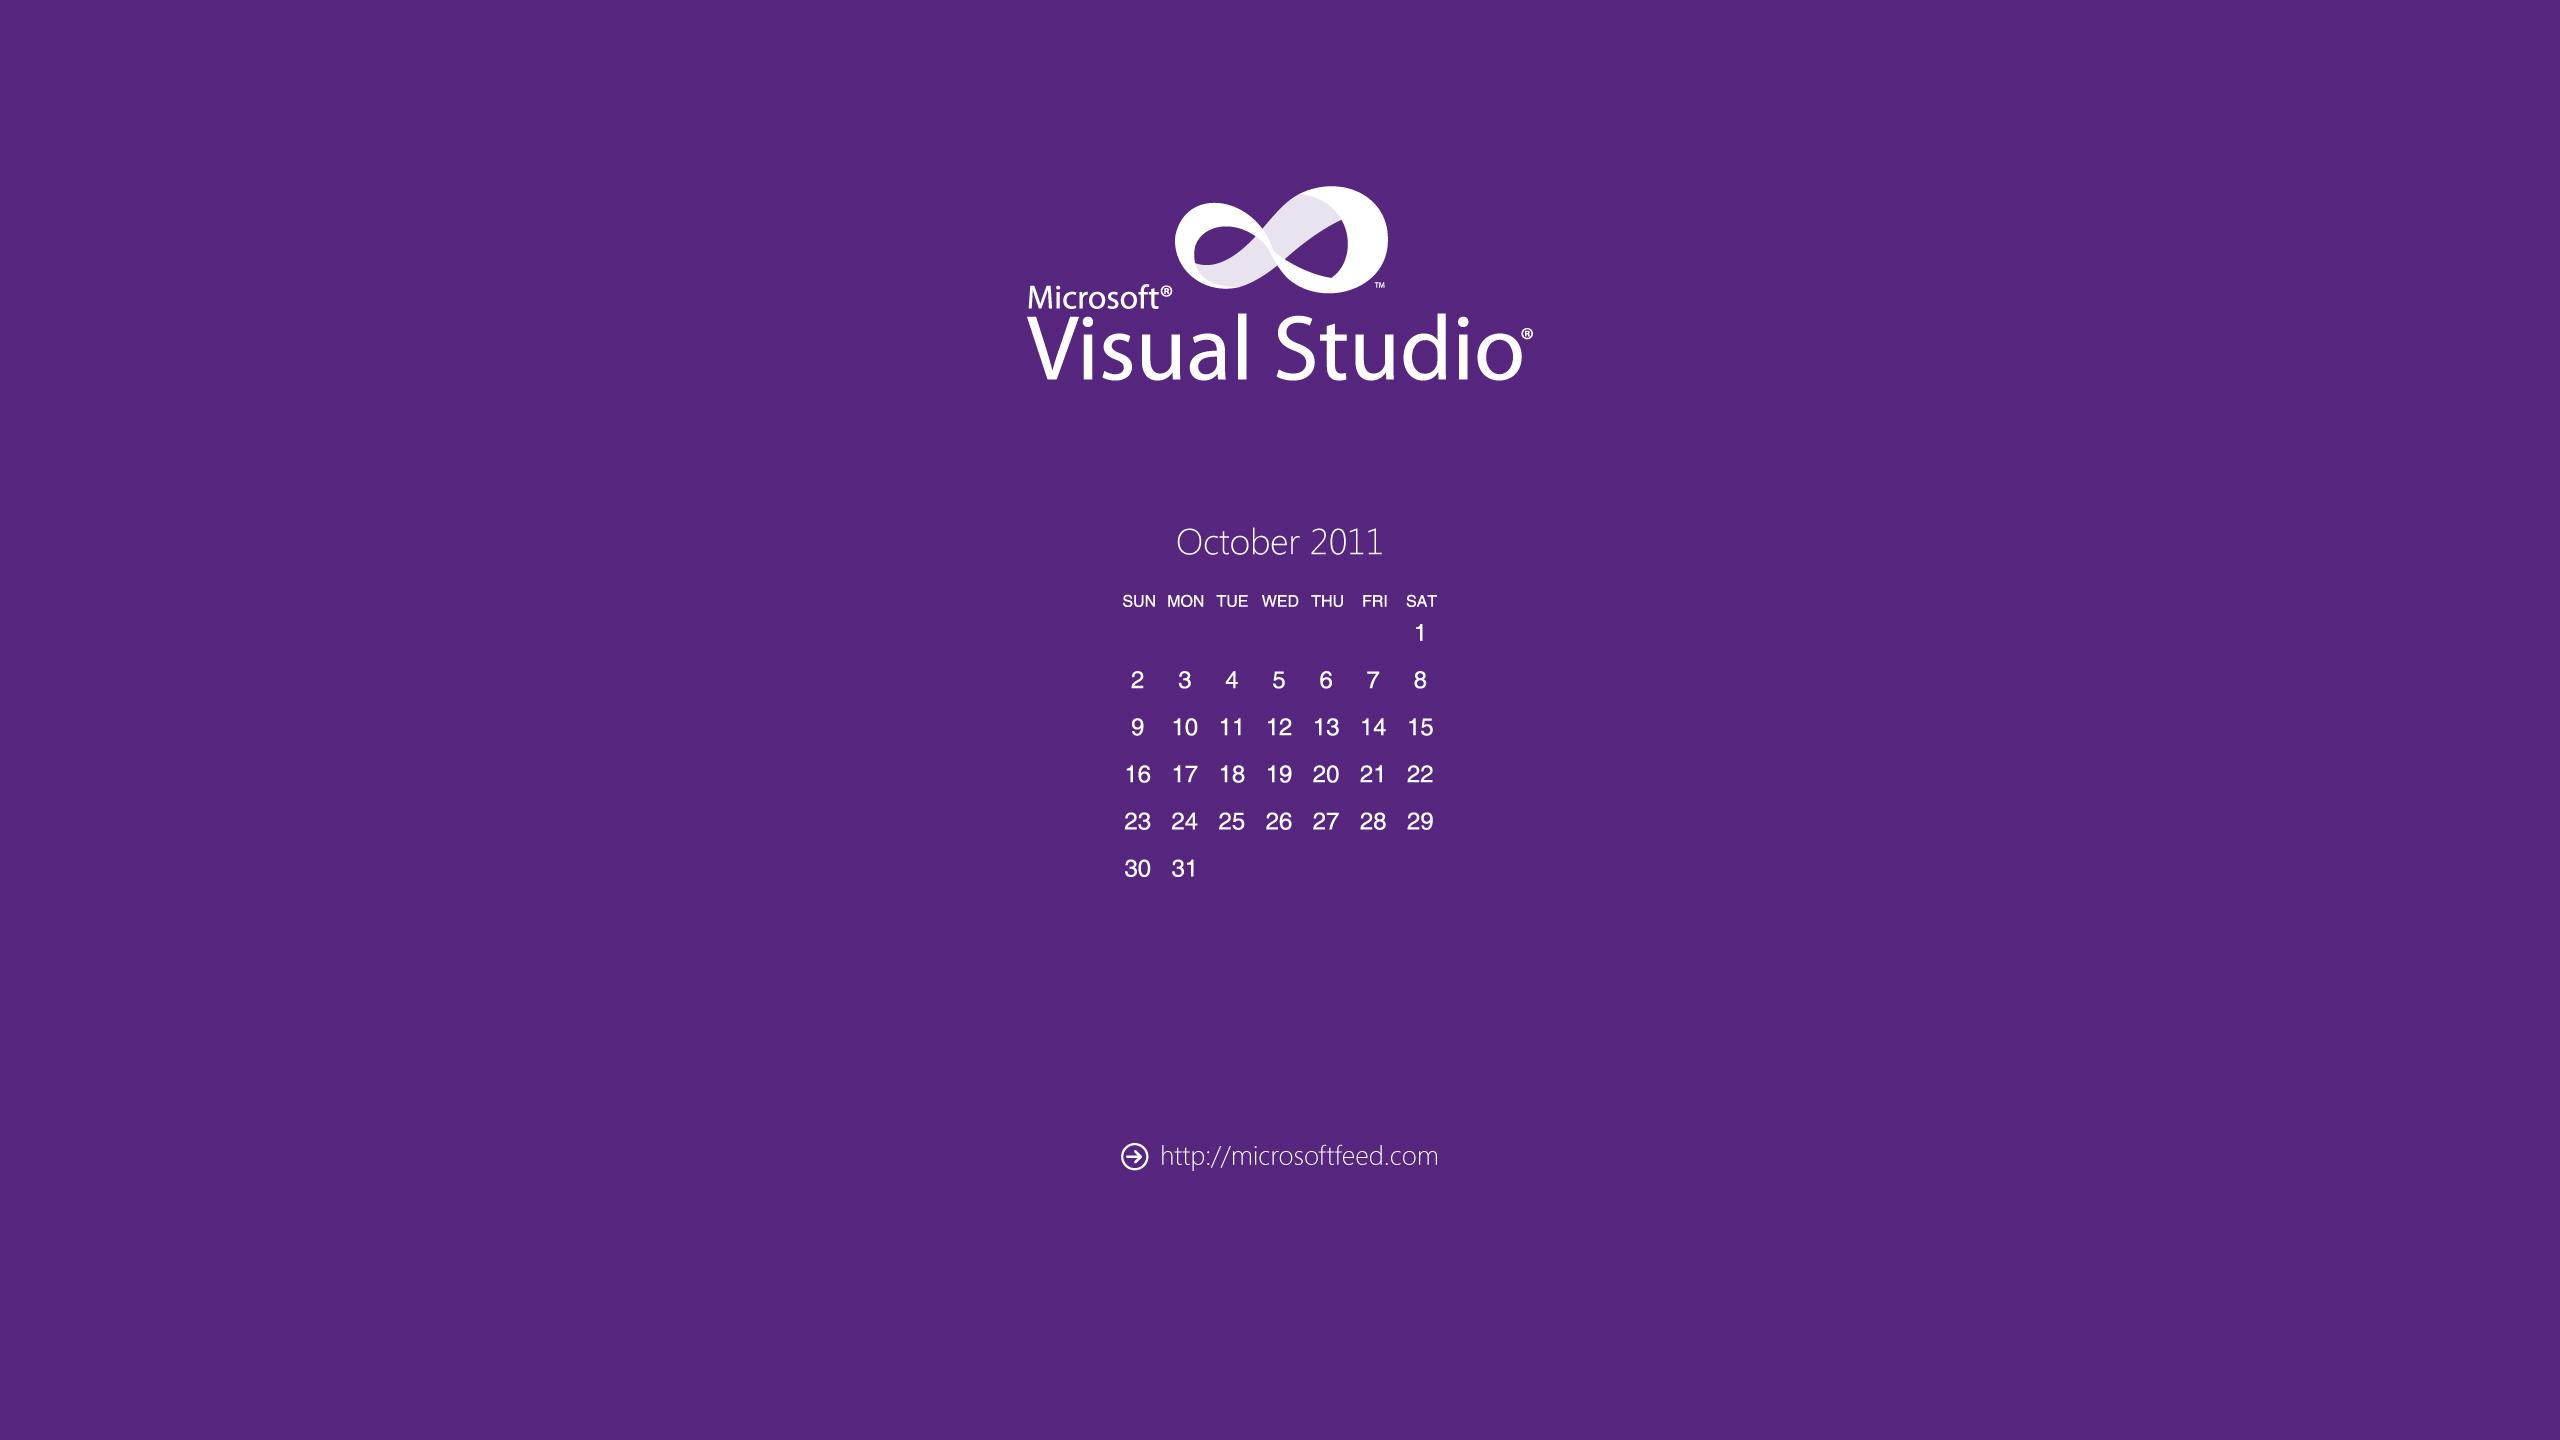 visual studio 2012 wallpaper - photo #22